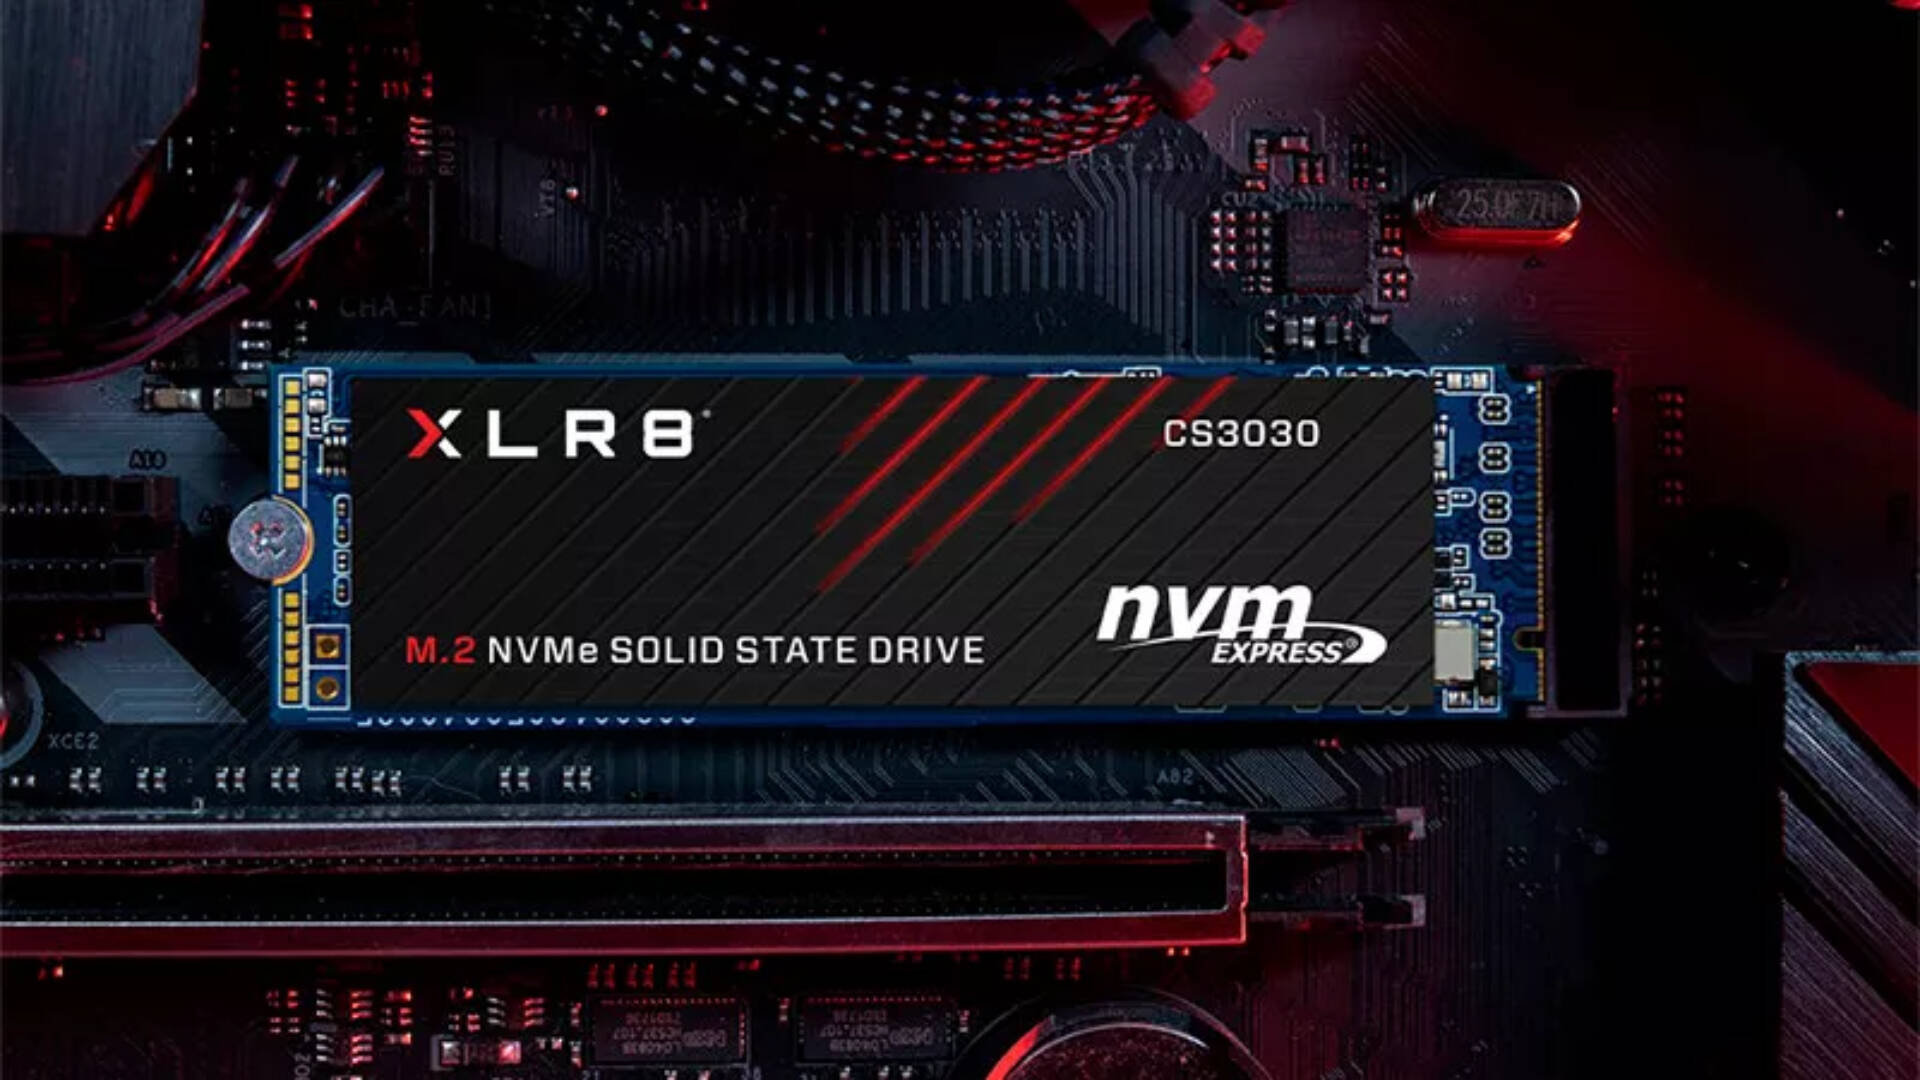 PNY XLR8 CS3030 SSD